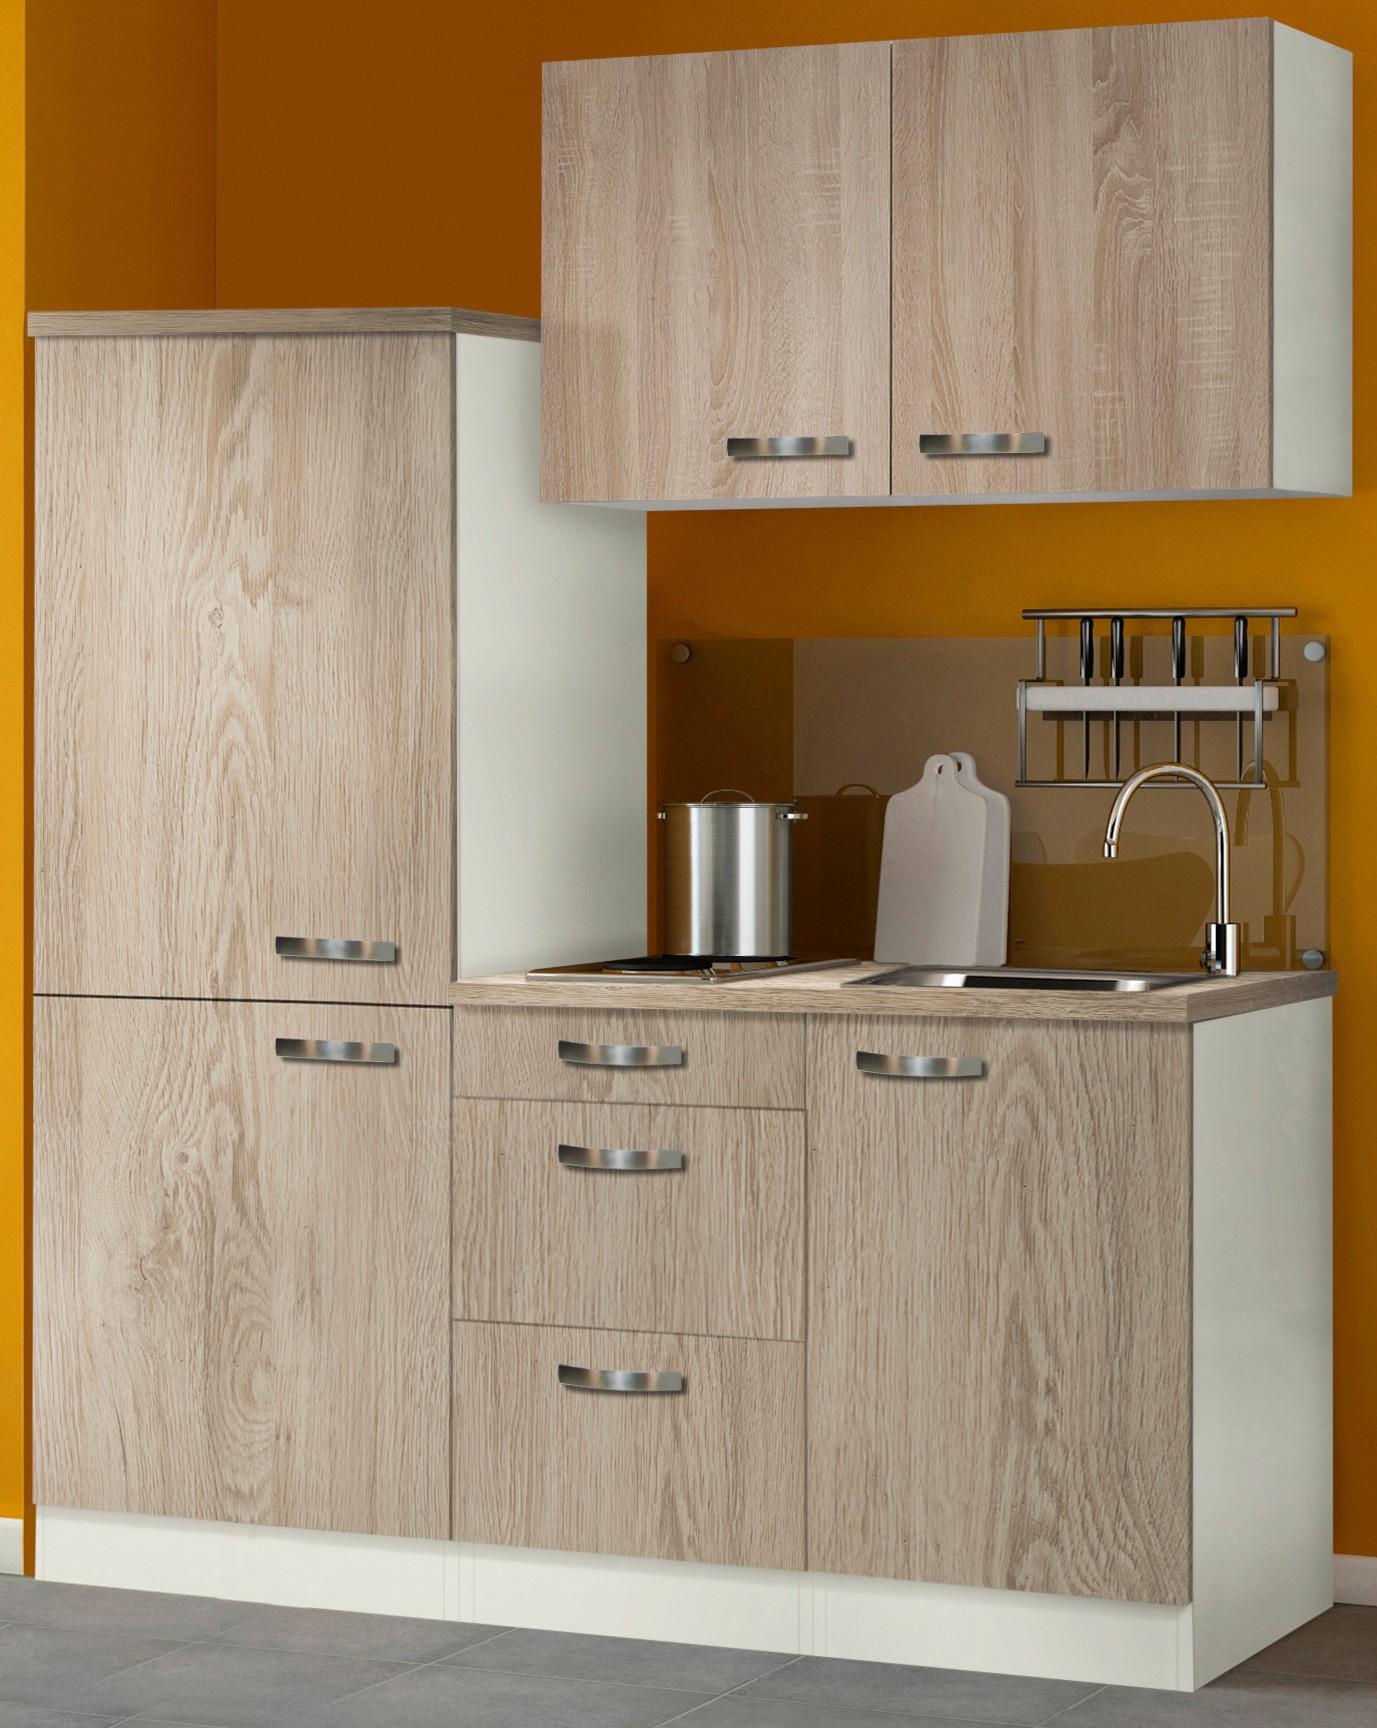 singlek che toledo mit elektro kochfeld breite 160 cm. Black Bedroom Furniture Sets. Home Design Ideas